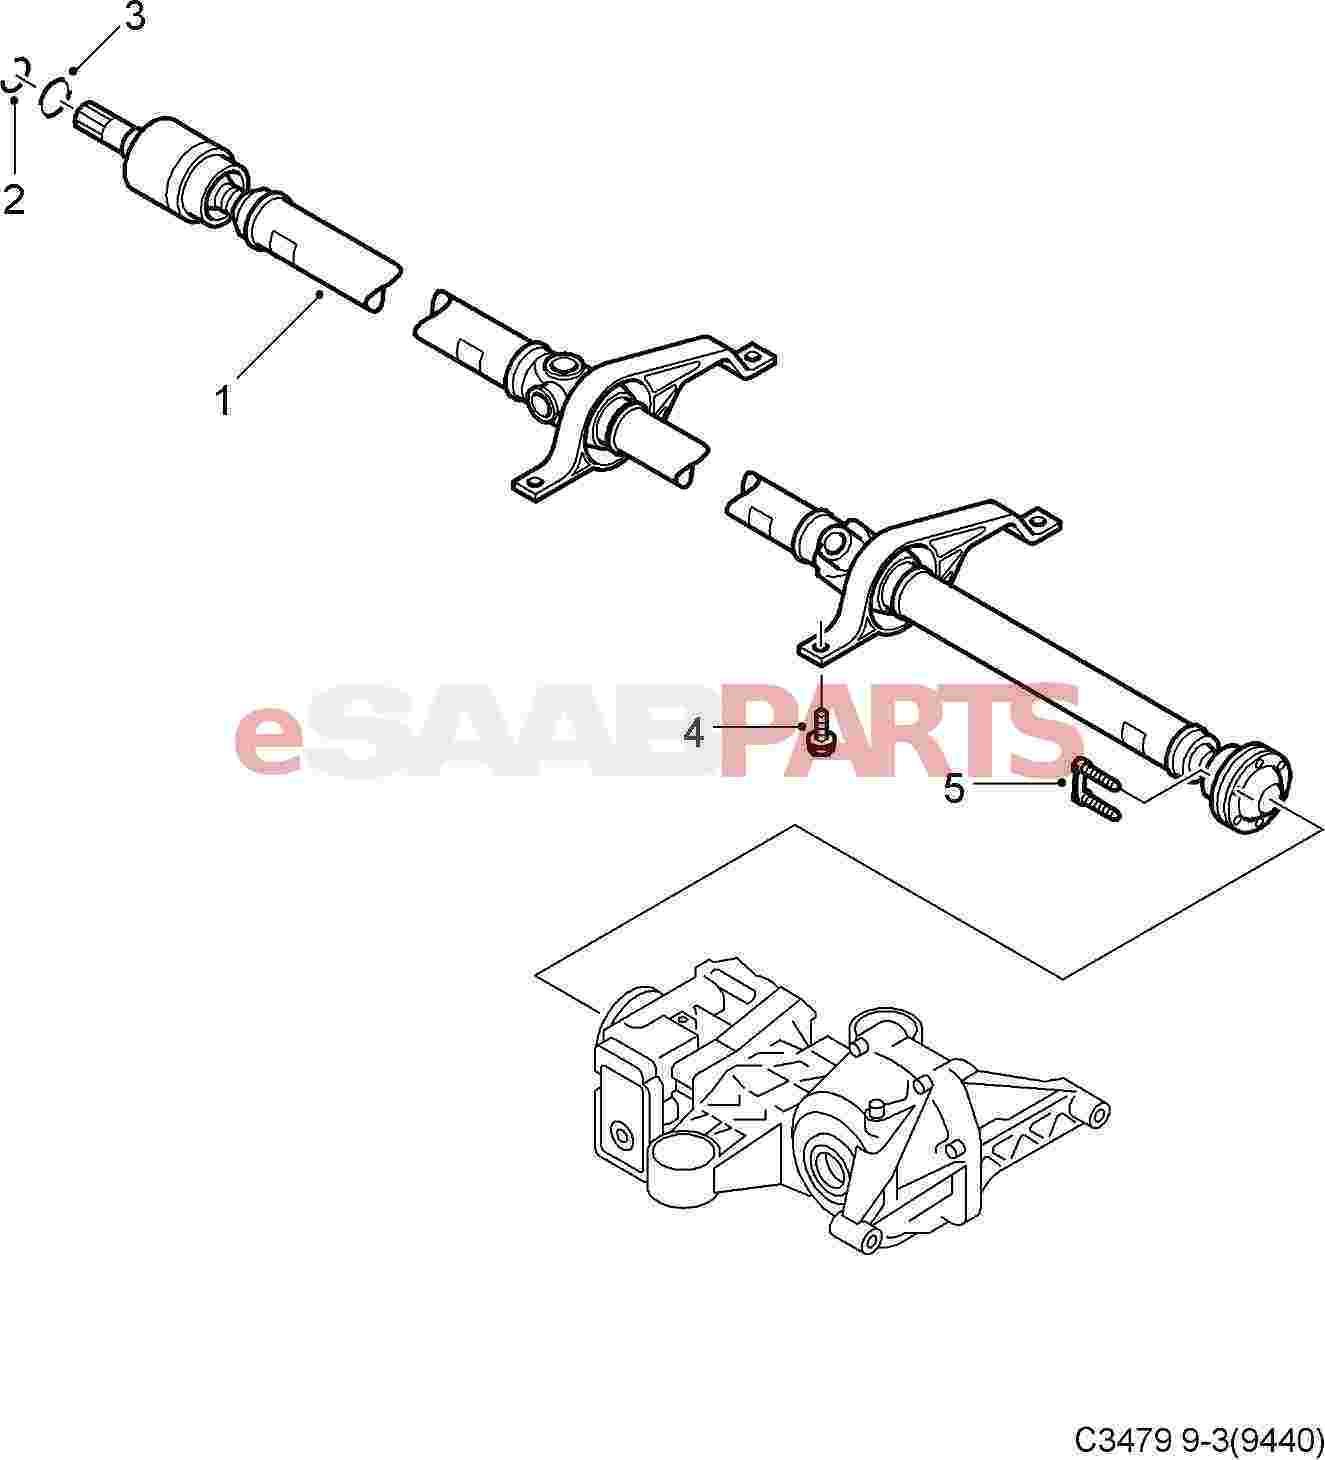 [12827398] SAAB XWD 9-3 Drive Shaft / Prop Shaft (3-Piece